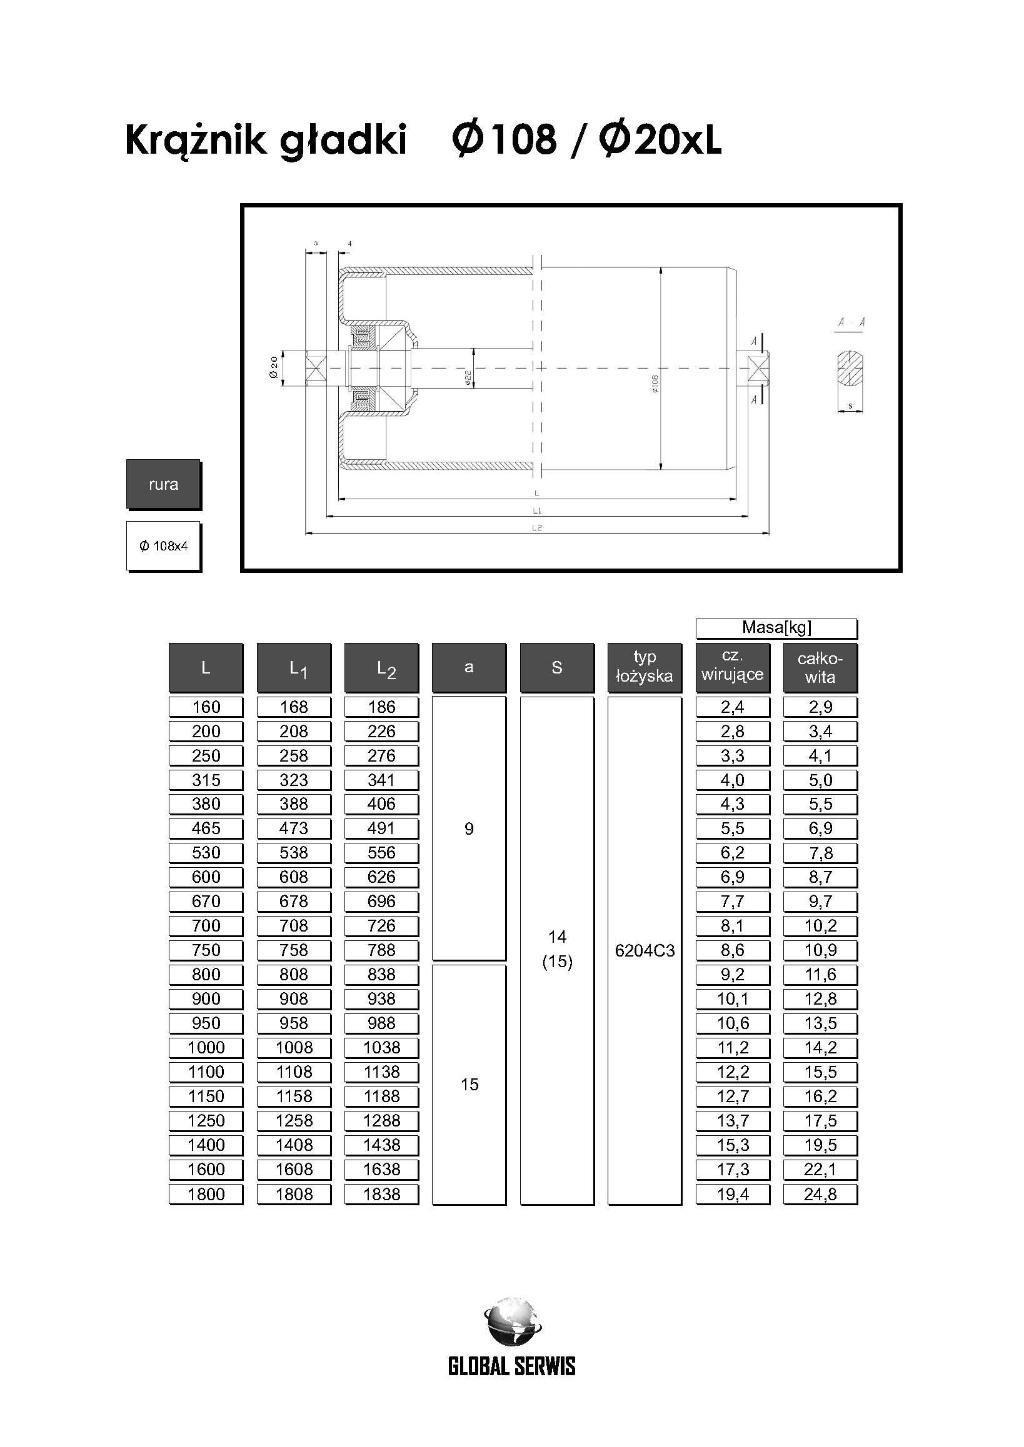 Krążnik Gładki 108 20xL